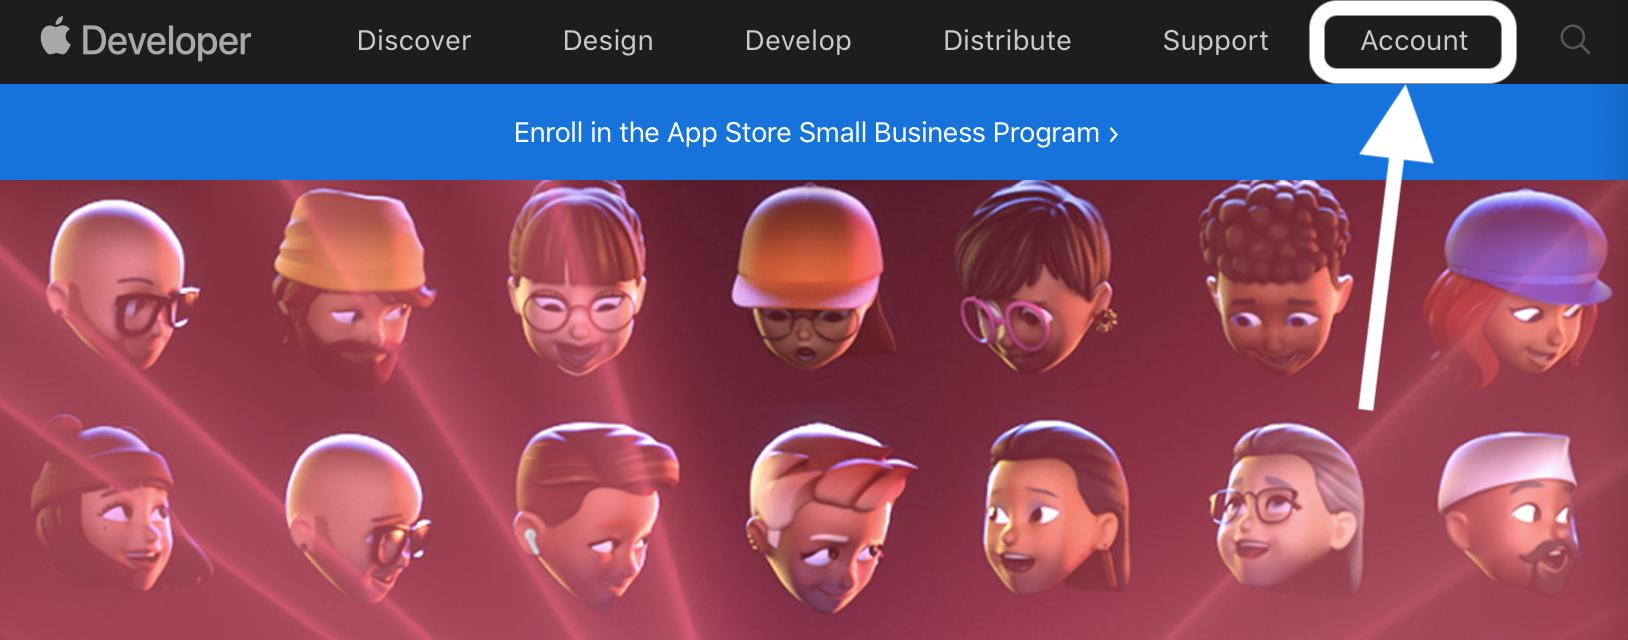 How to install macOS Monterey beta walkthrough 1 - click Account on Apple's Developer website